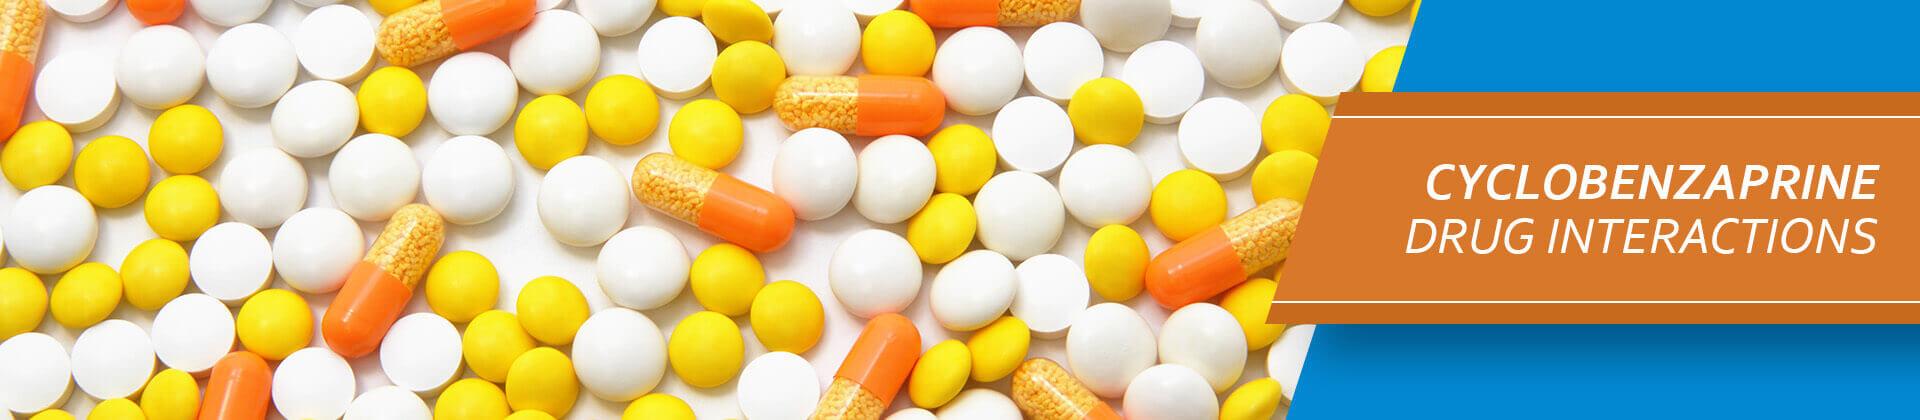 Cyclobenzaprine Drug Interactions